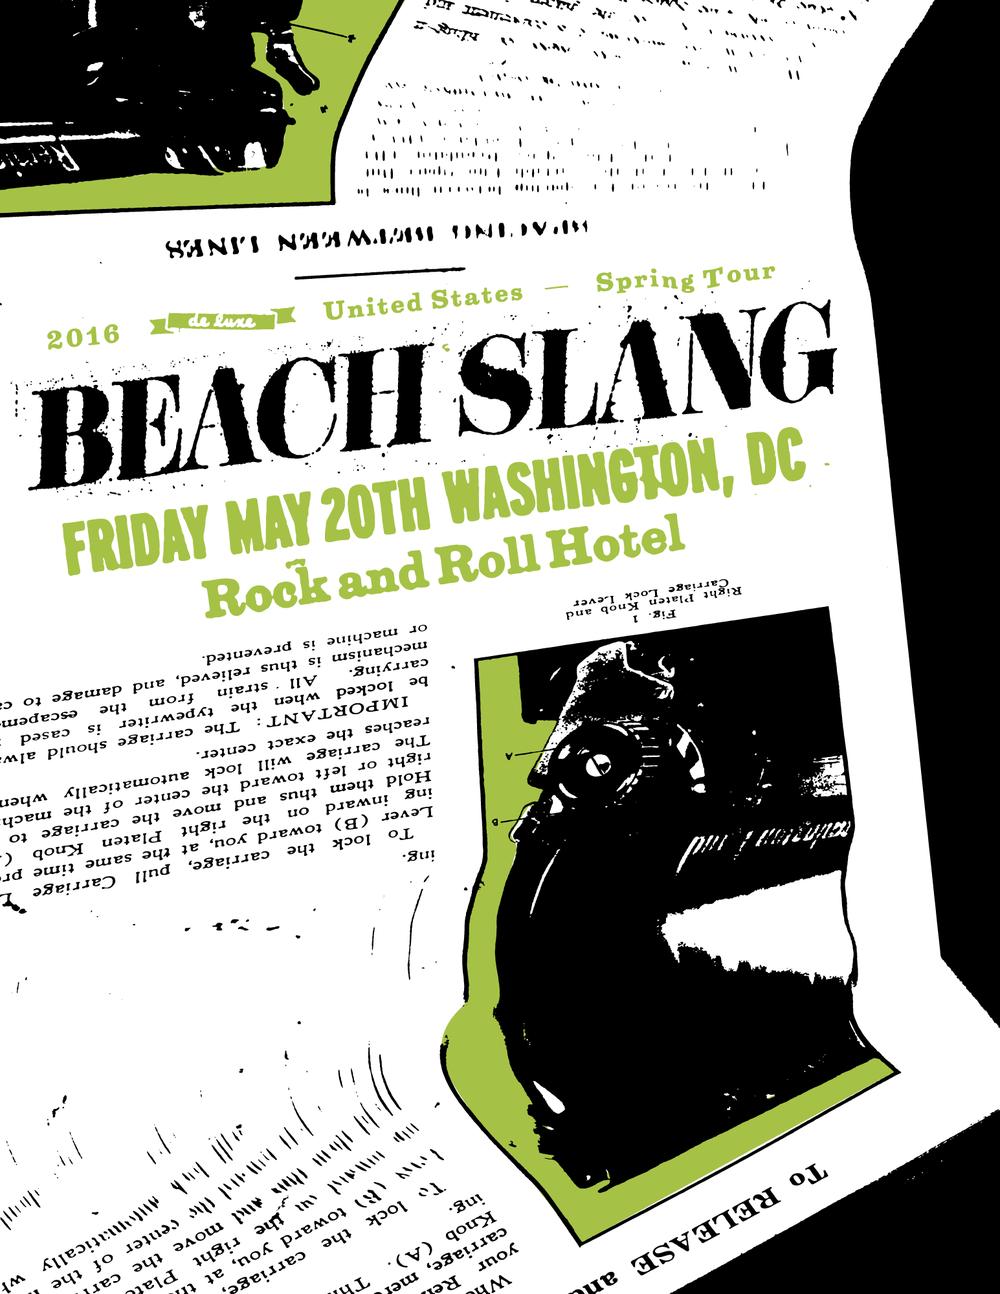 BeachSlang_5-20_WashDC_r1.png